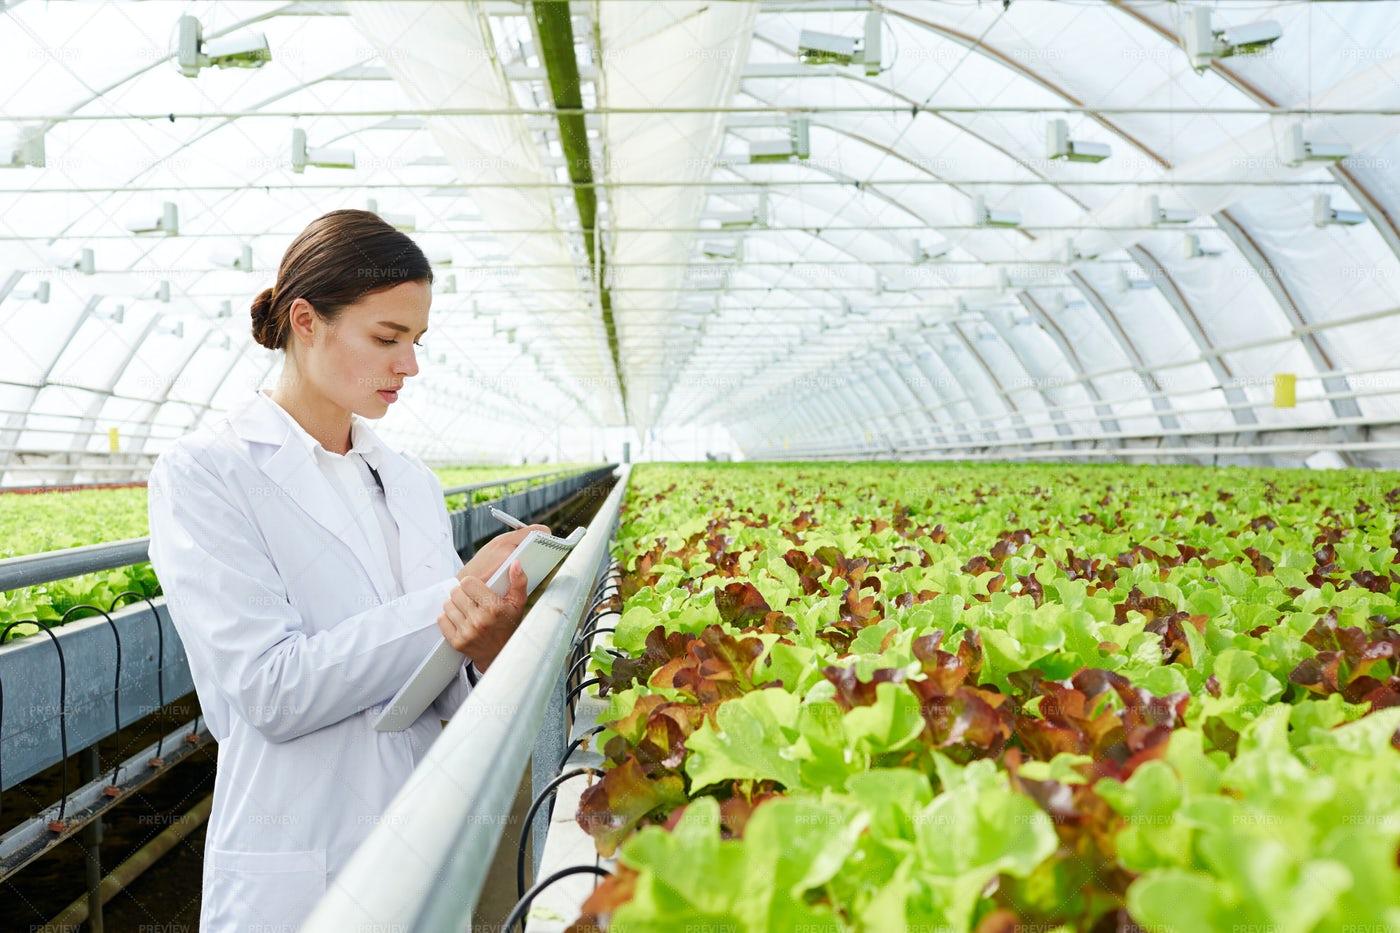 Woman Inspecting Greenhouse: Stock Photos